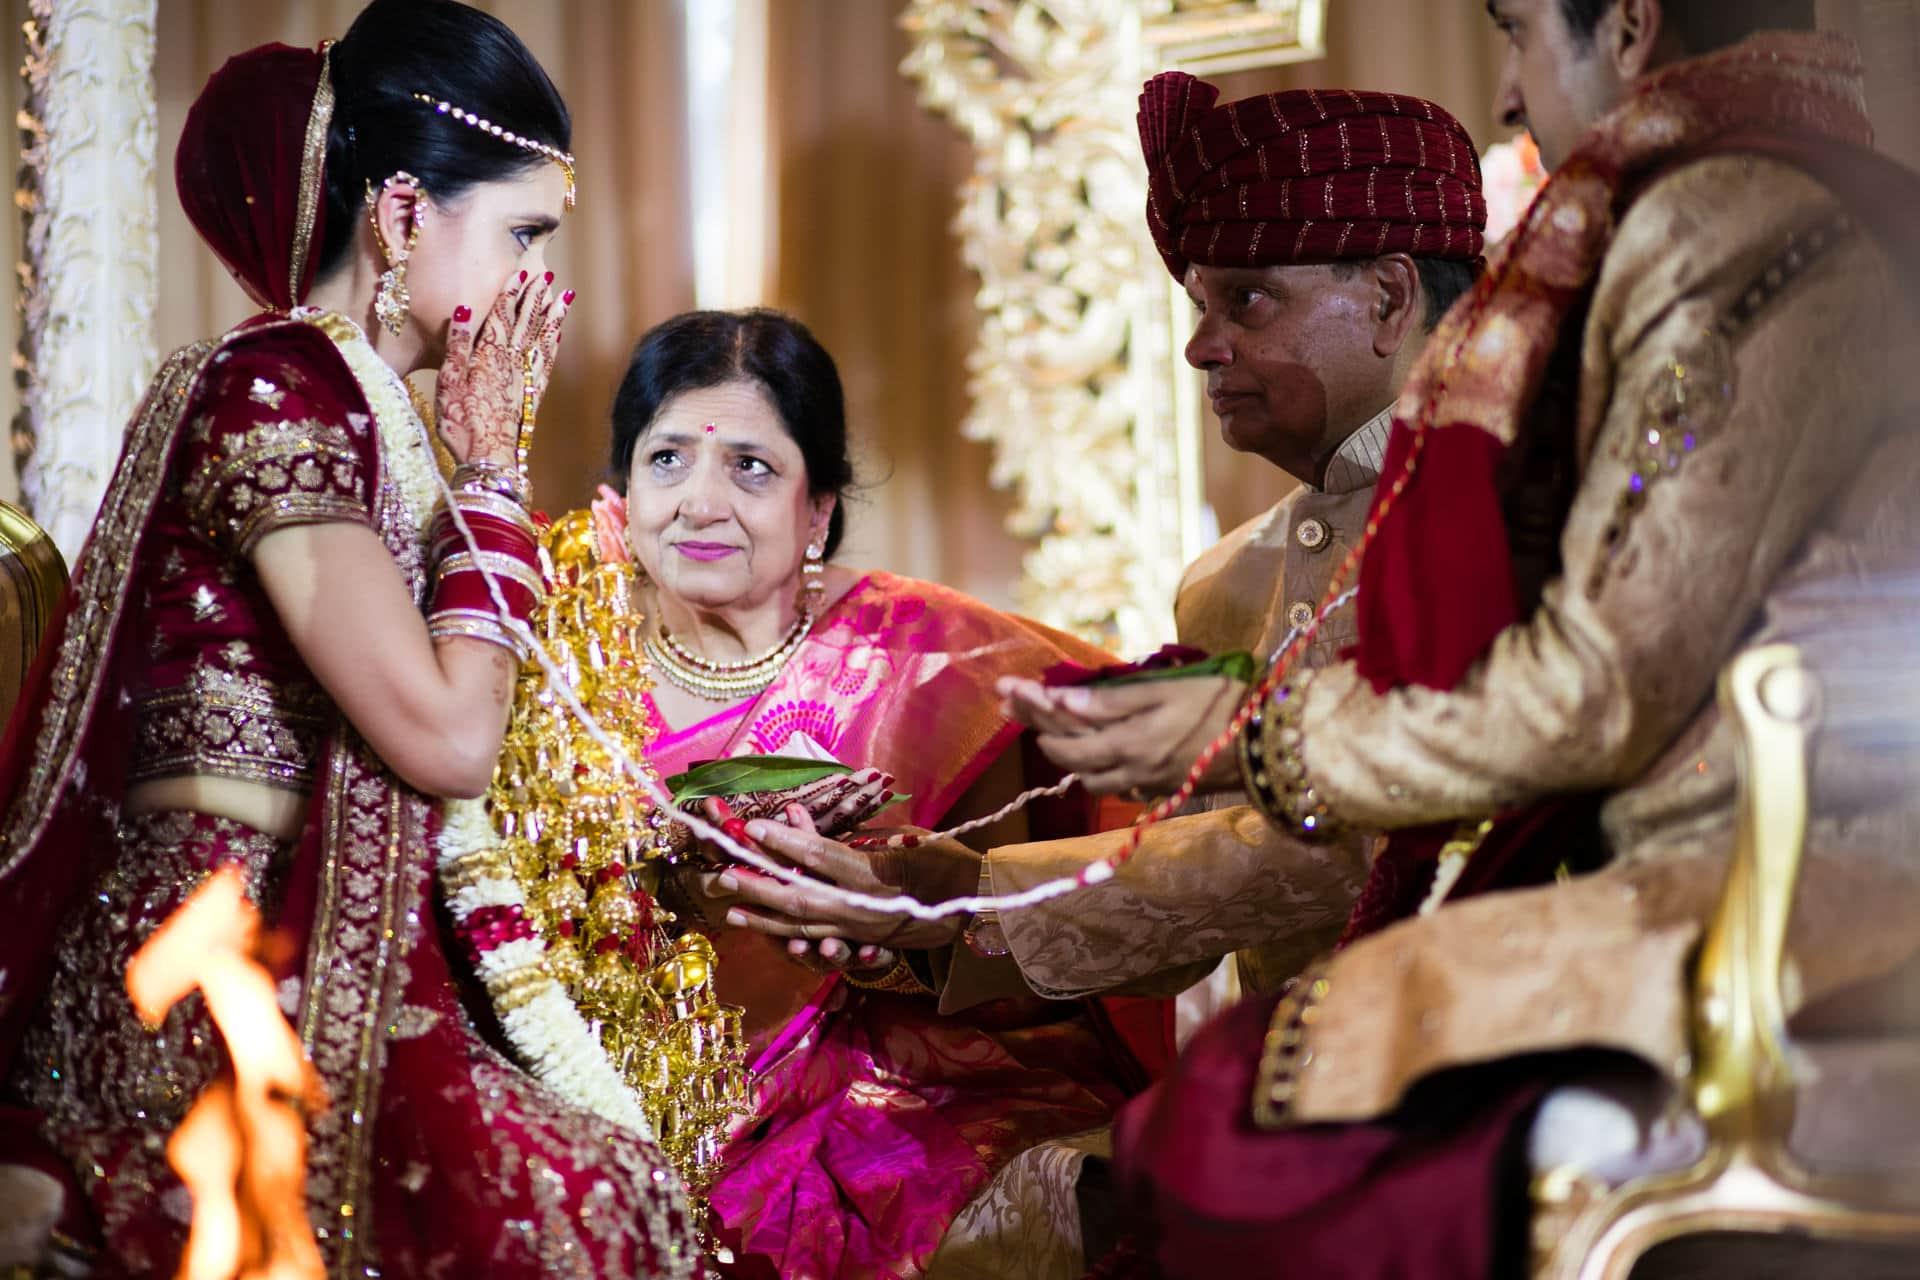 Bride wiping her tears